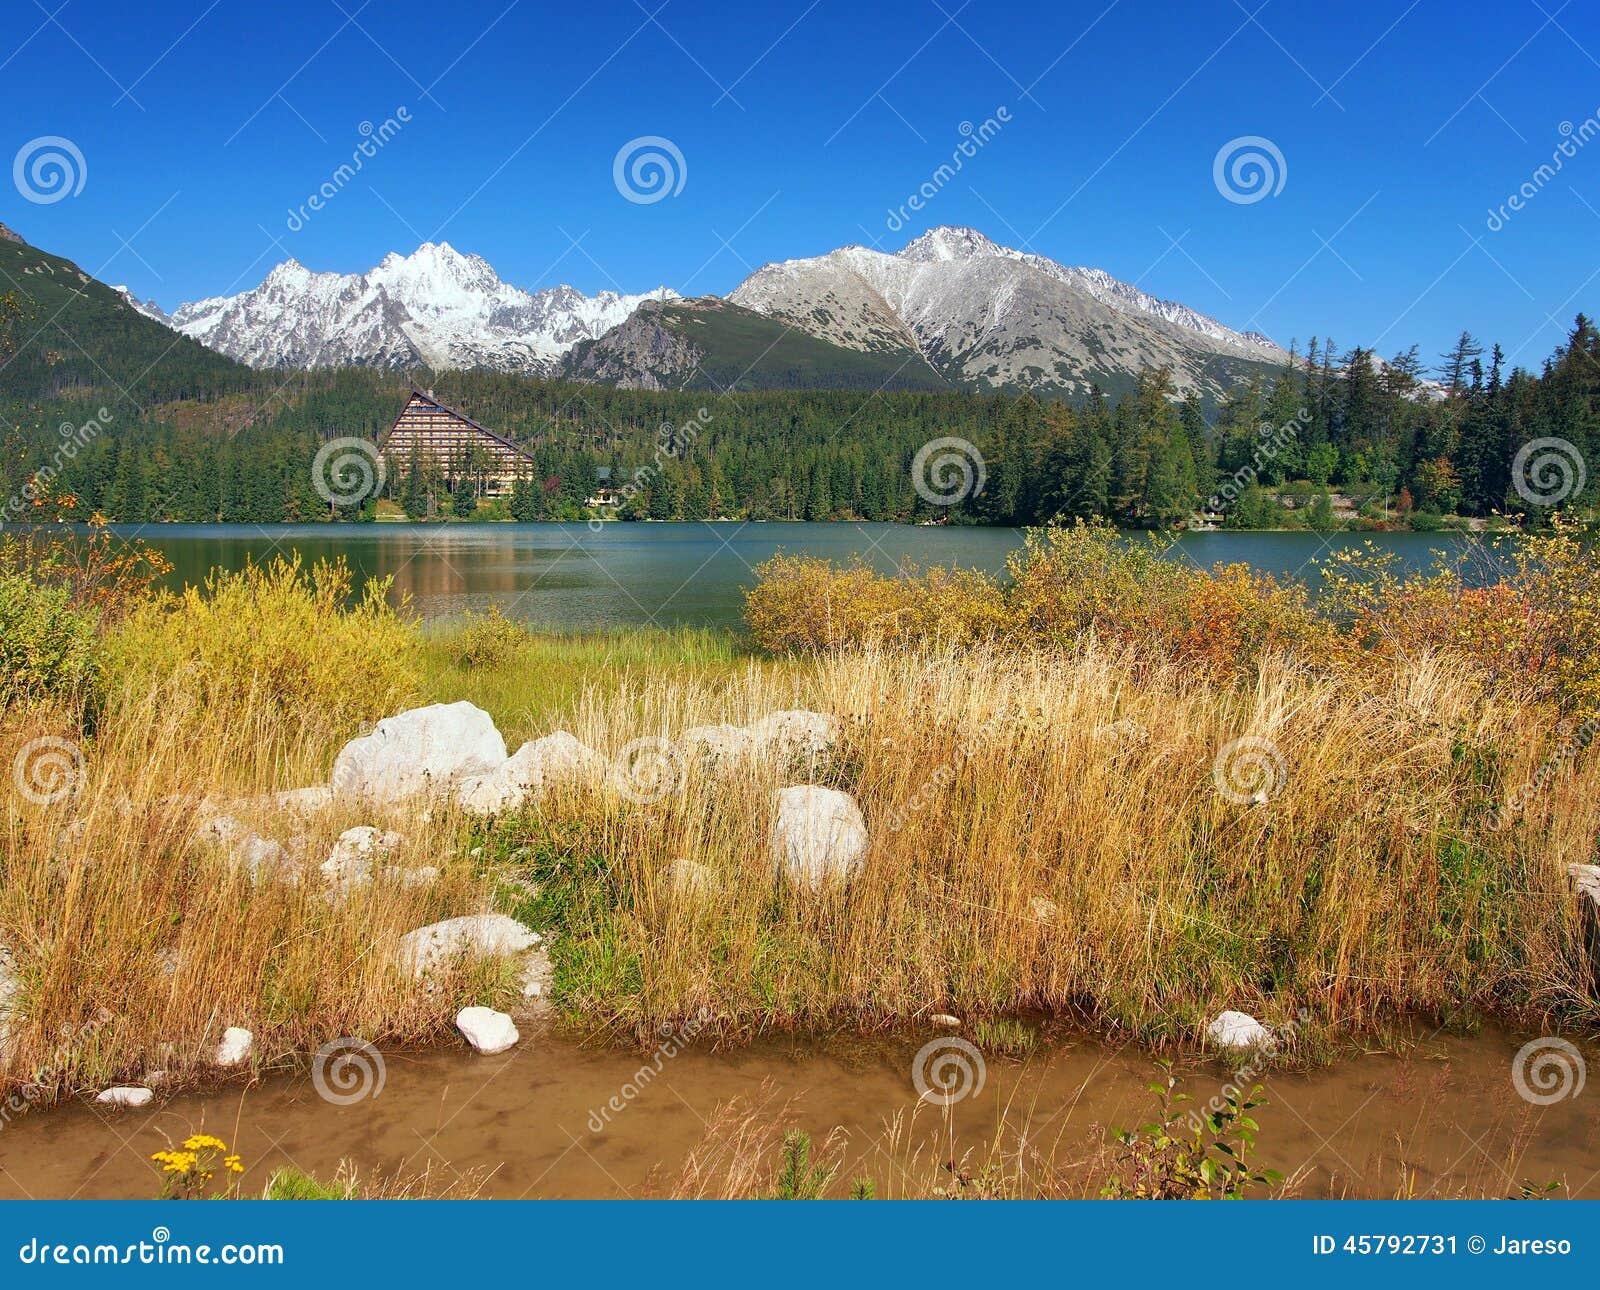 Autumn at Strbske Pleso, High Tatras, Slovakia